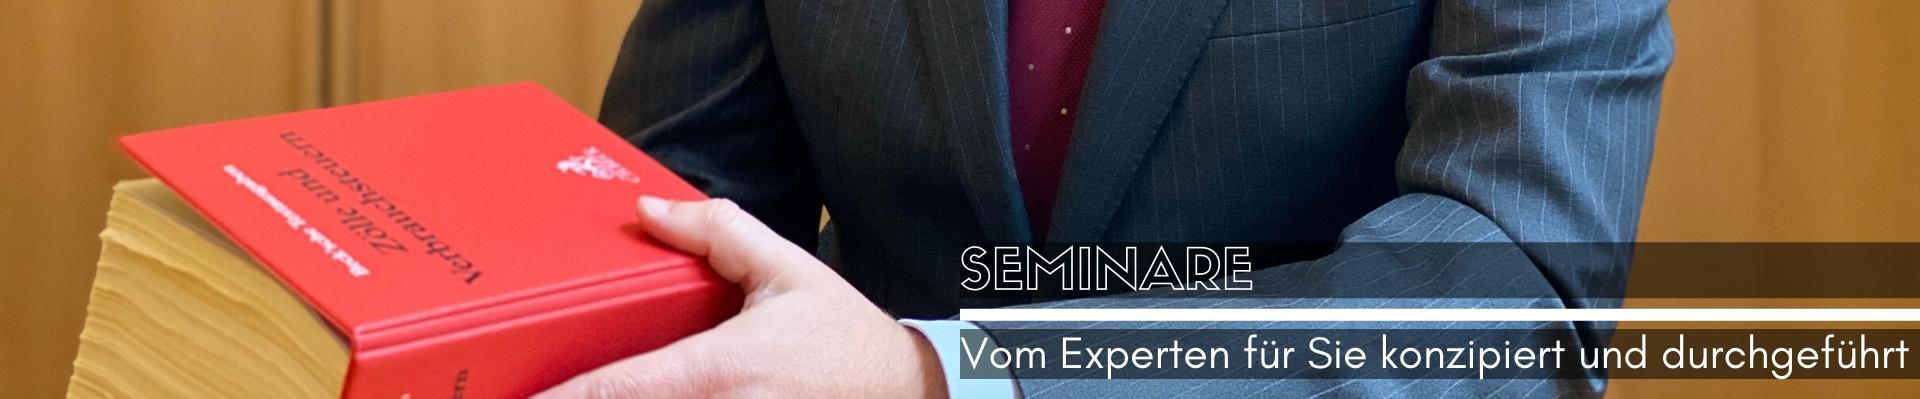 Rechtsanwalt Axel Krause - Seminare